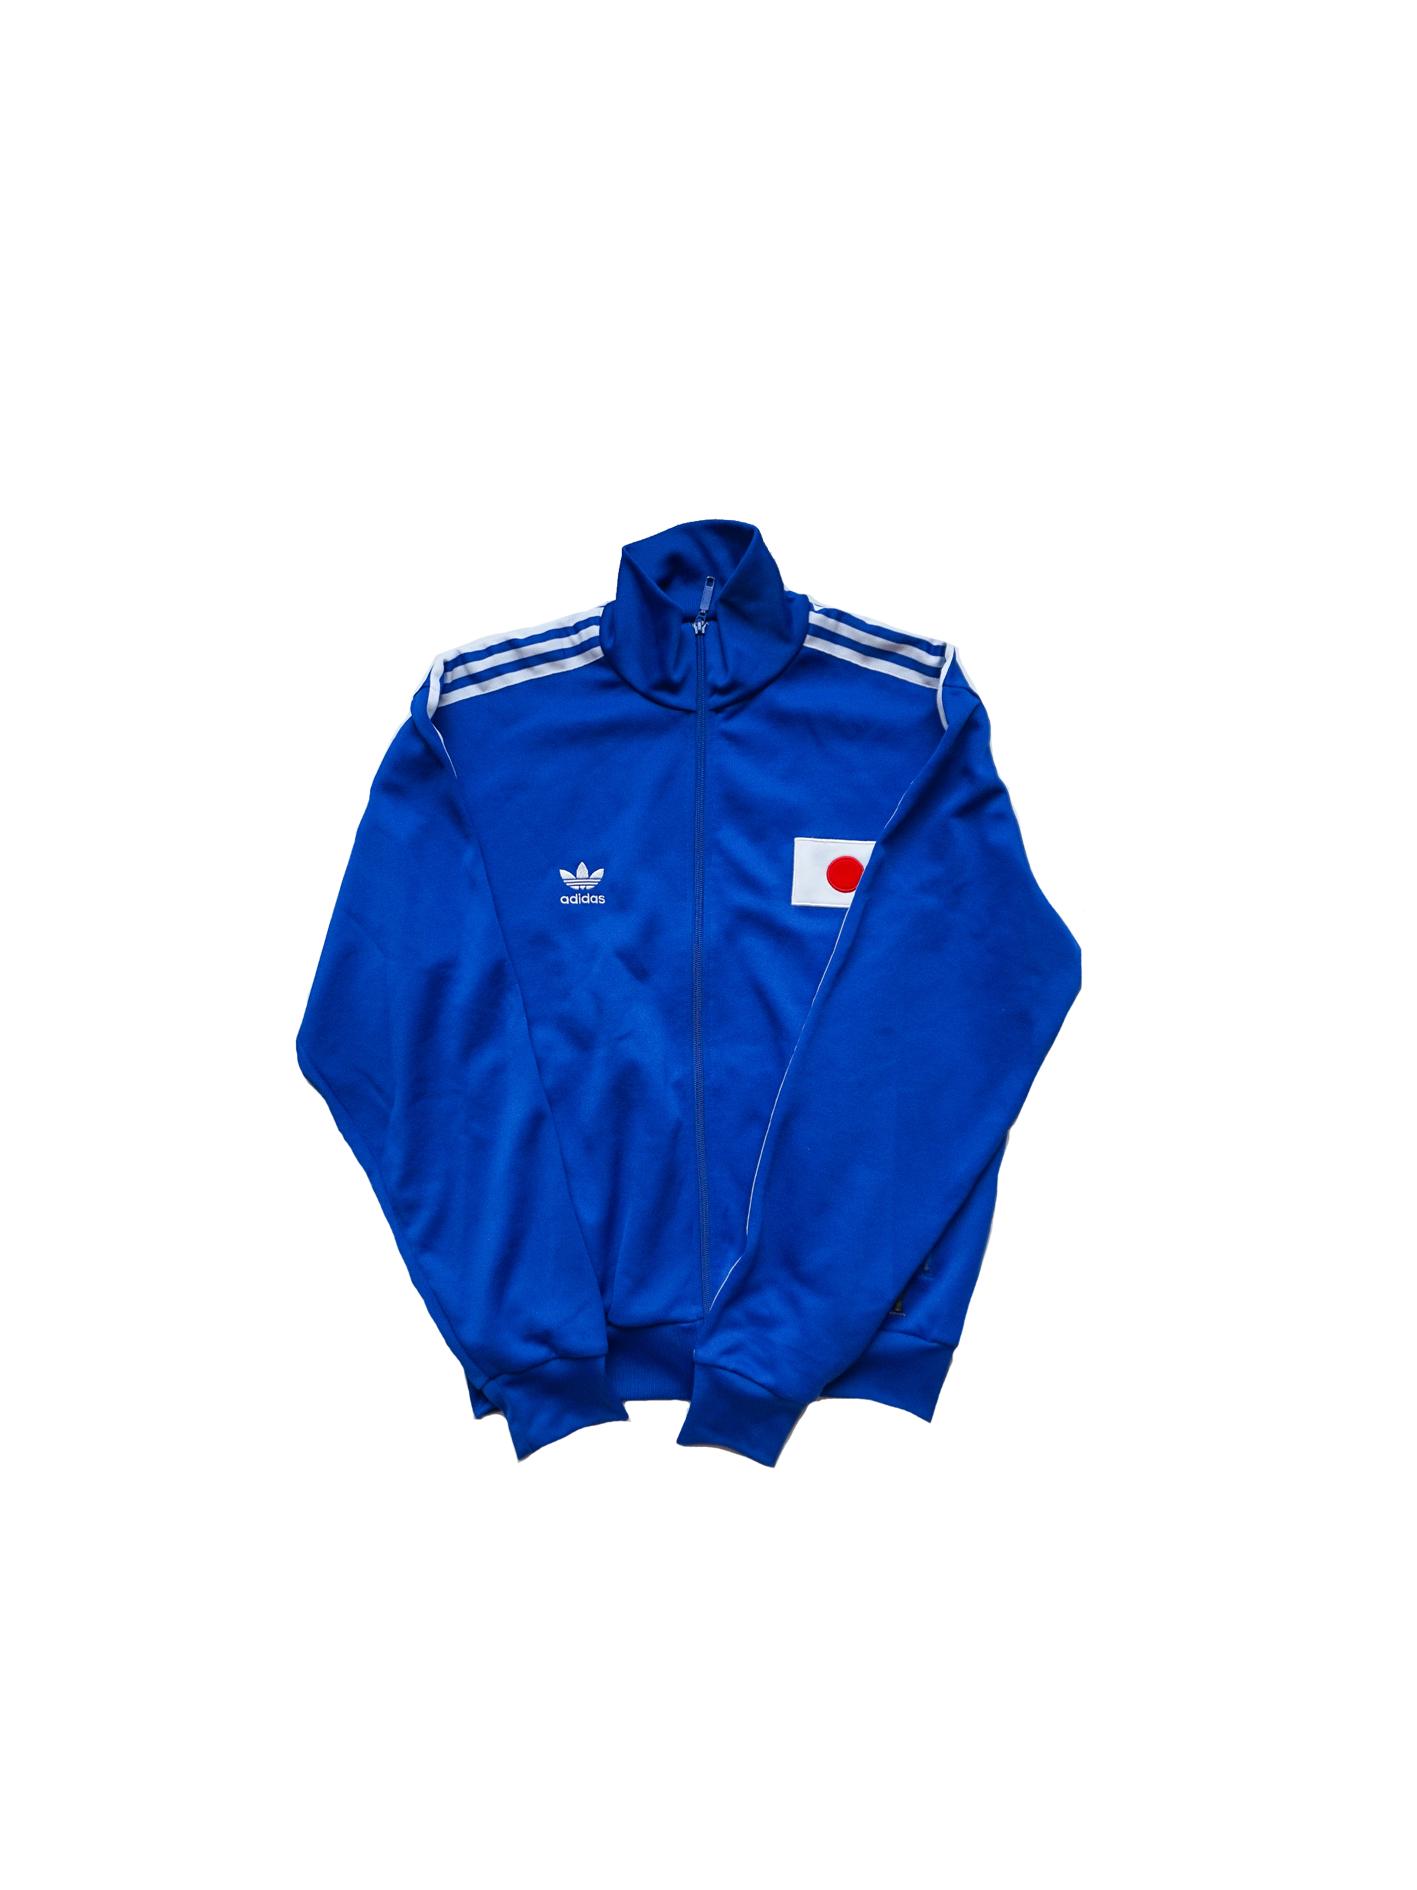 Adidas Nippon Full Zip